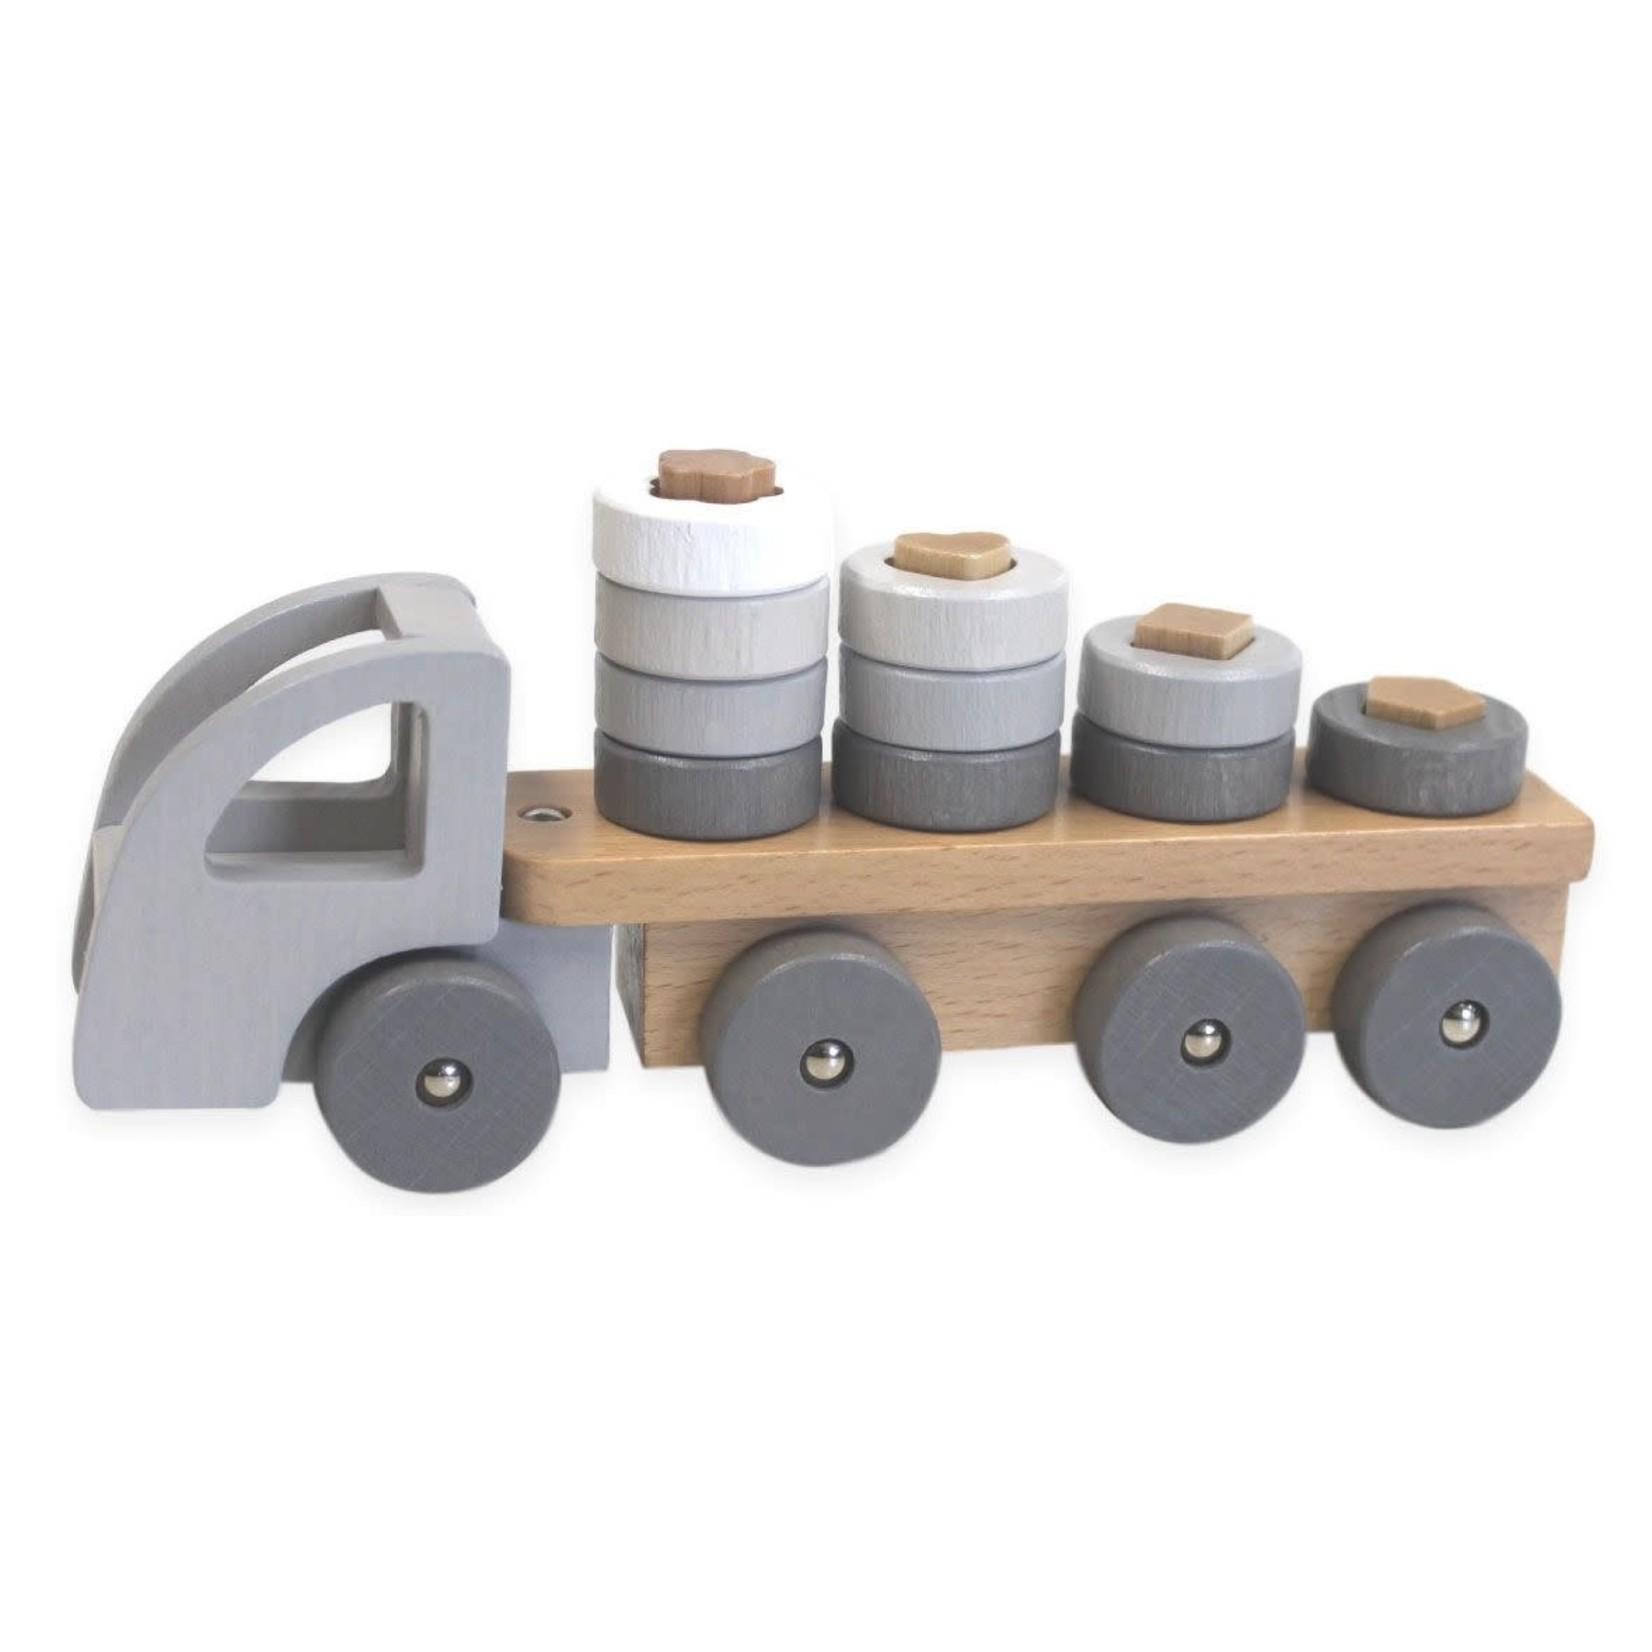 Baby Brands Discoveroo: Mini Sort n Stack Truck